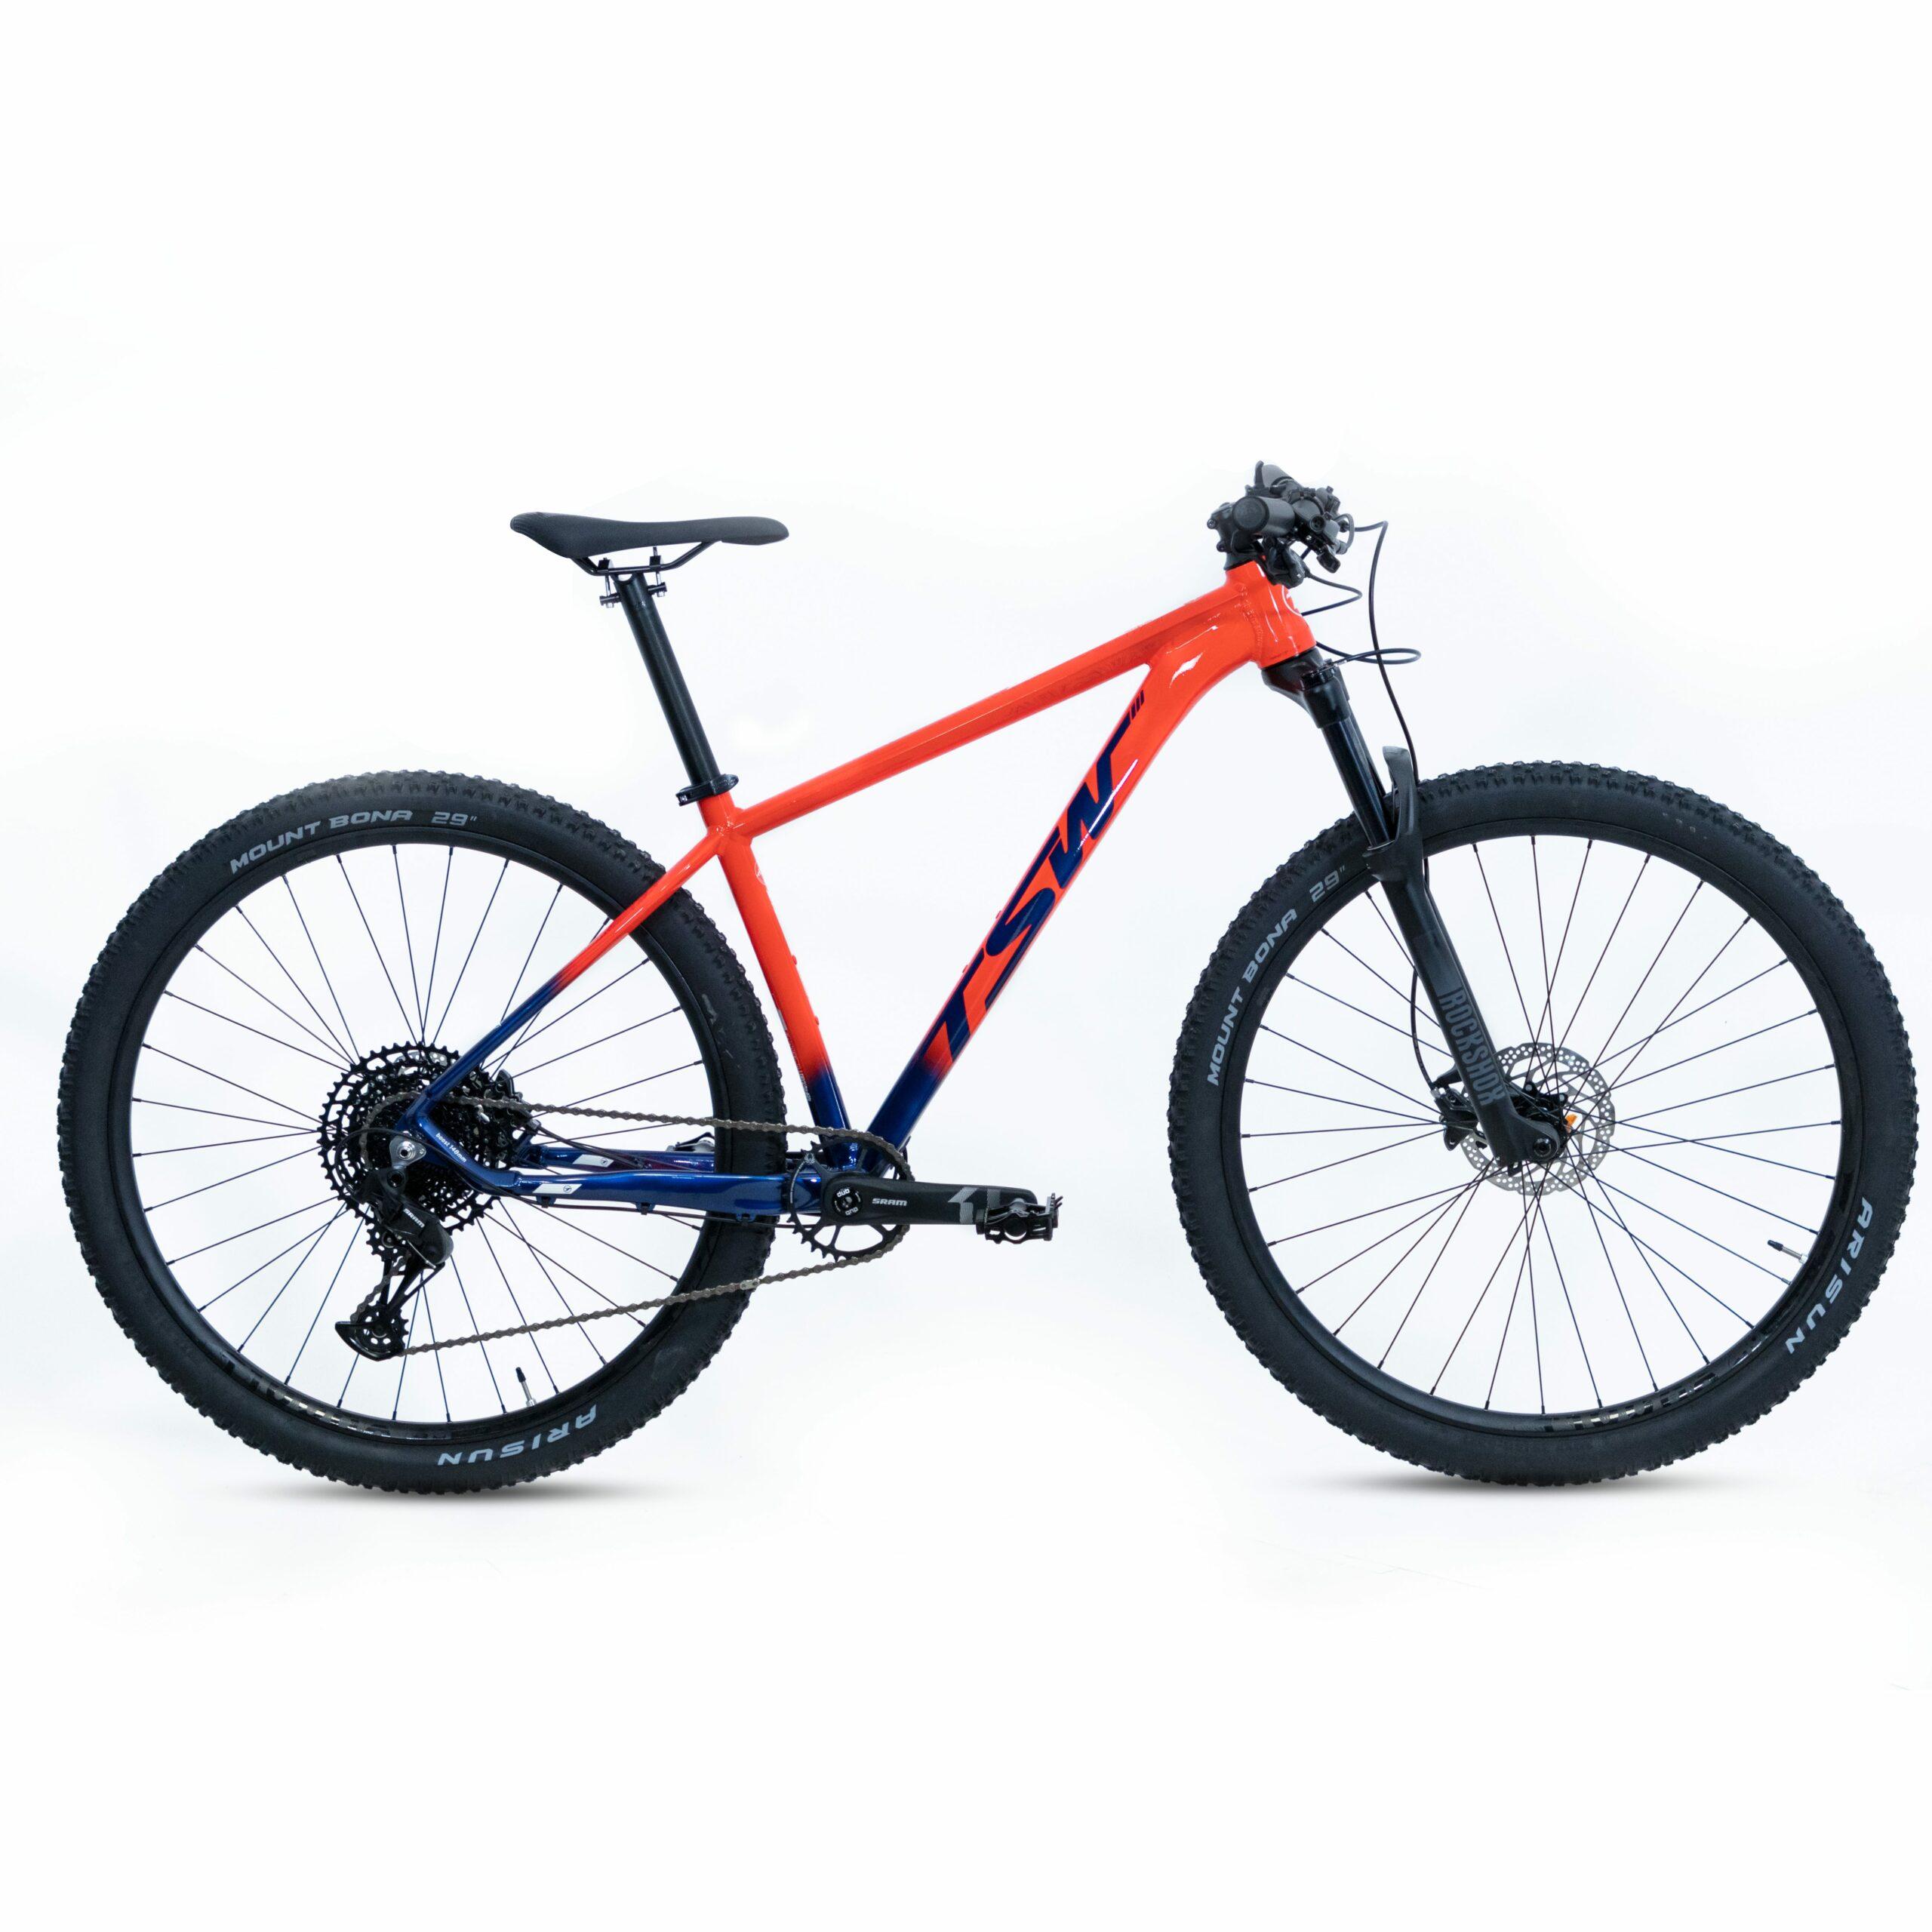 Bicicleta TSW Yukon | SM-12 | 2021/2022 2